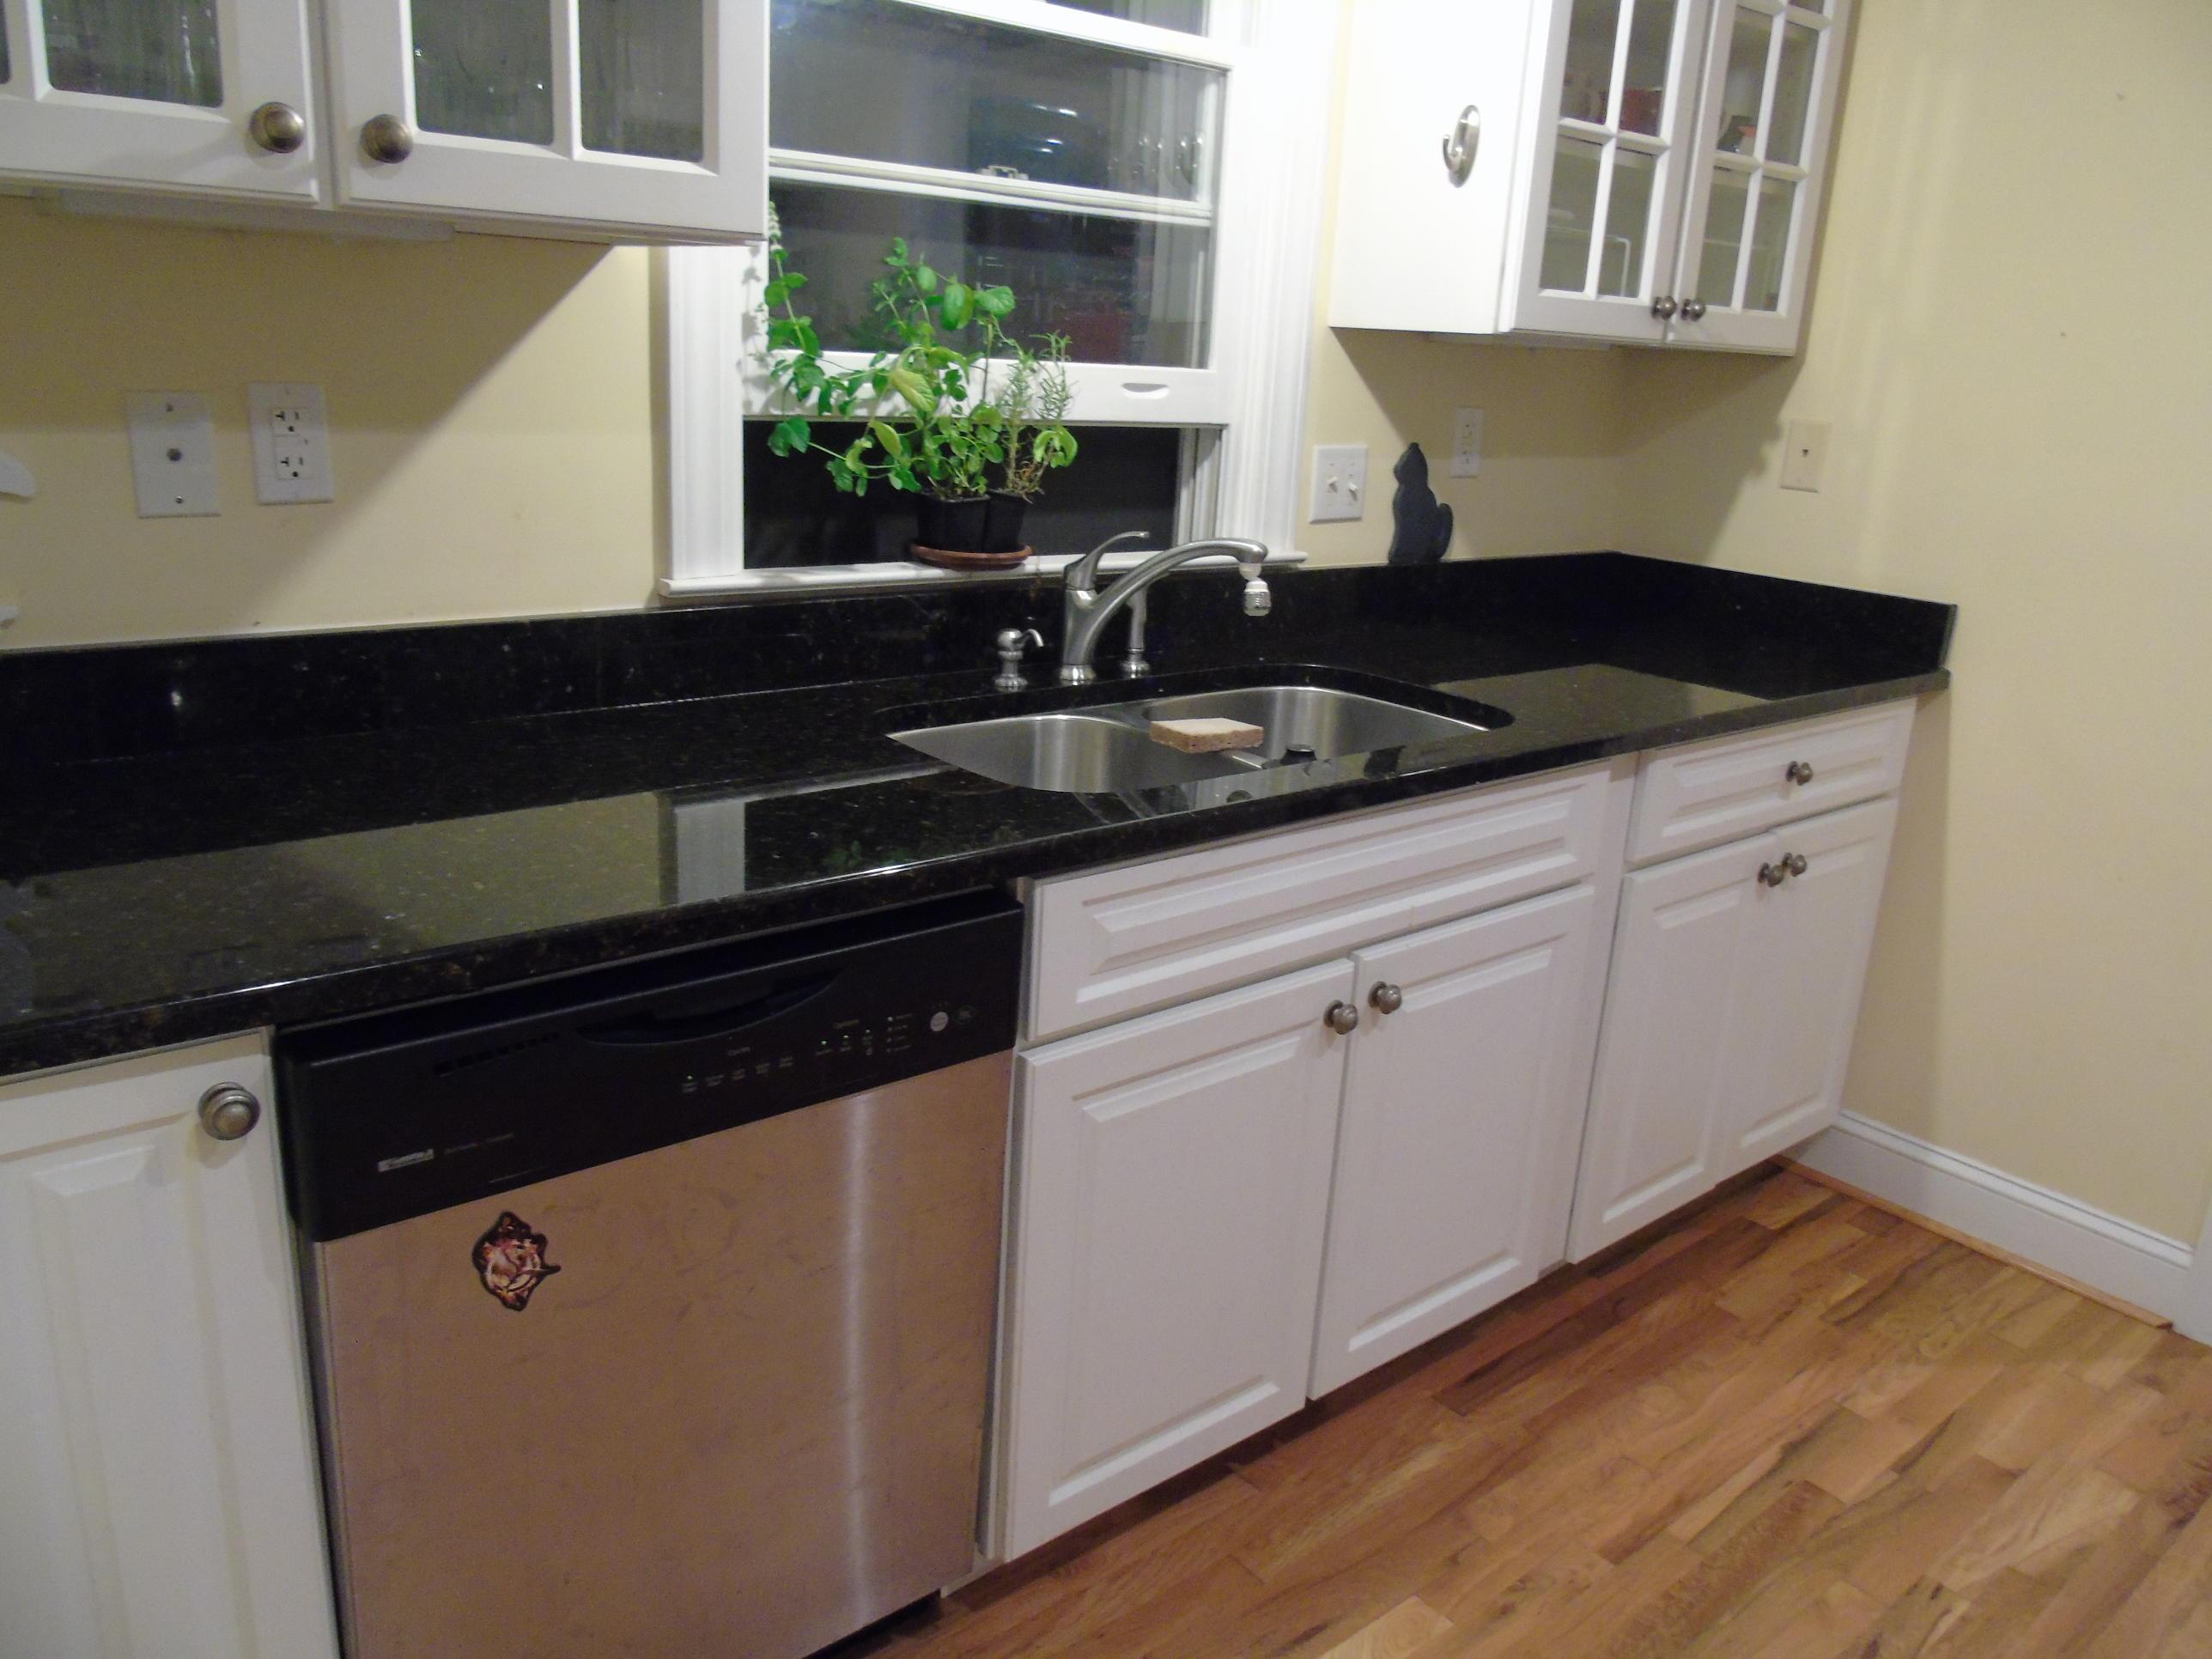 Kp S Kitchen On Reservation Ny